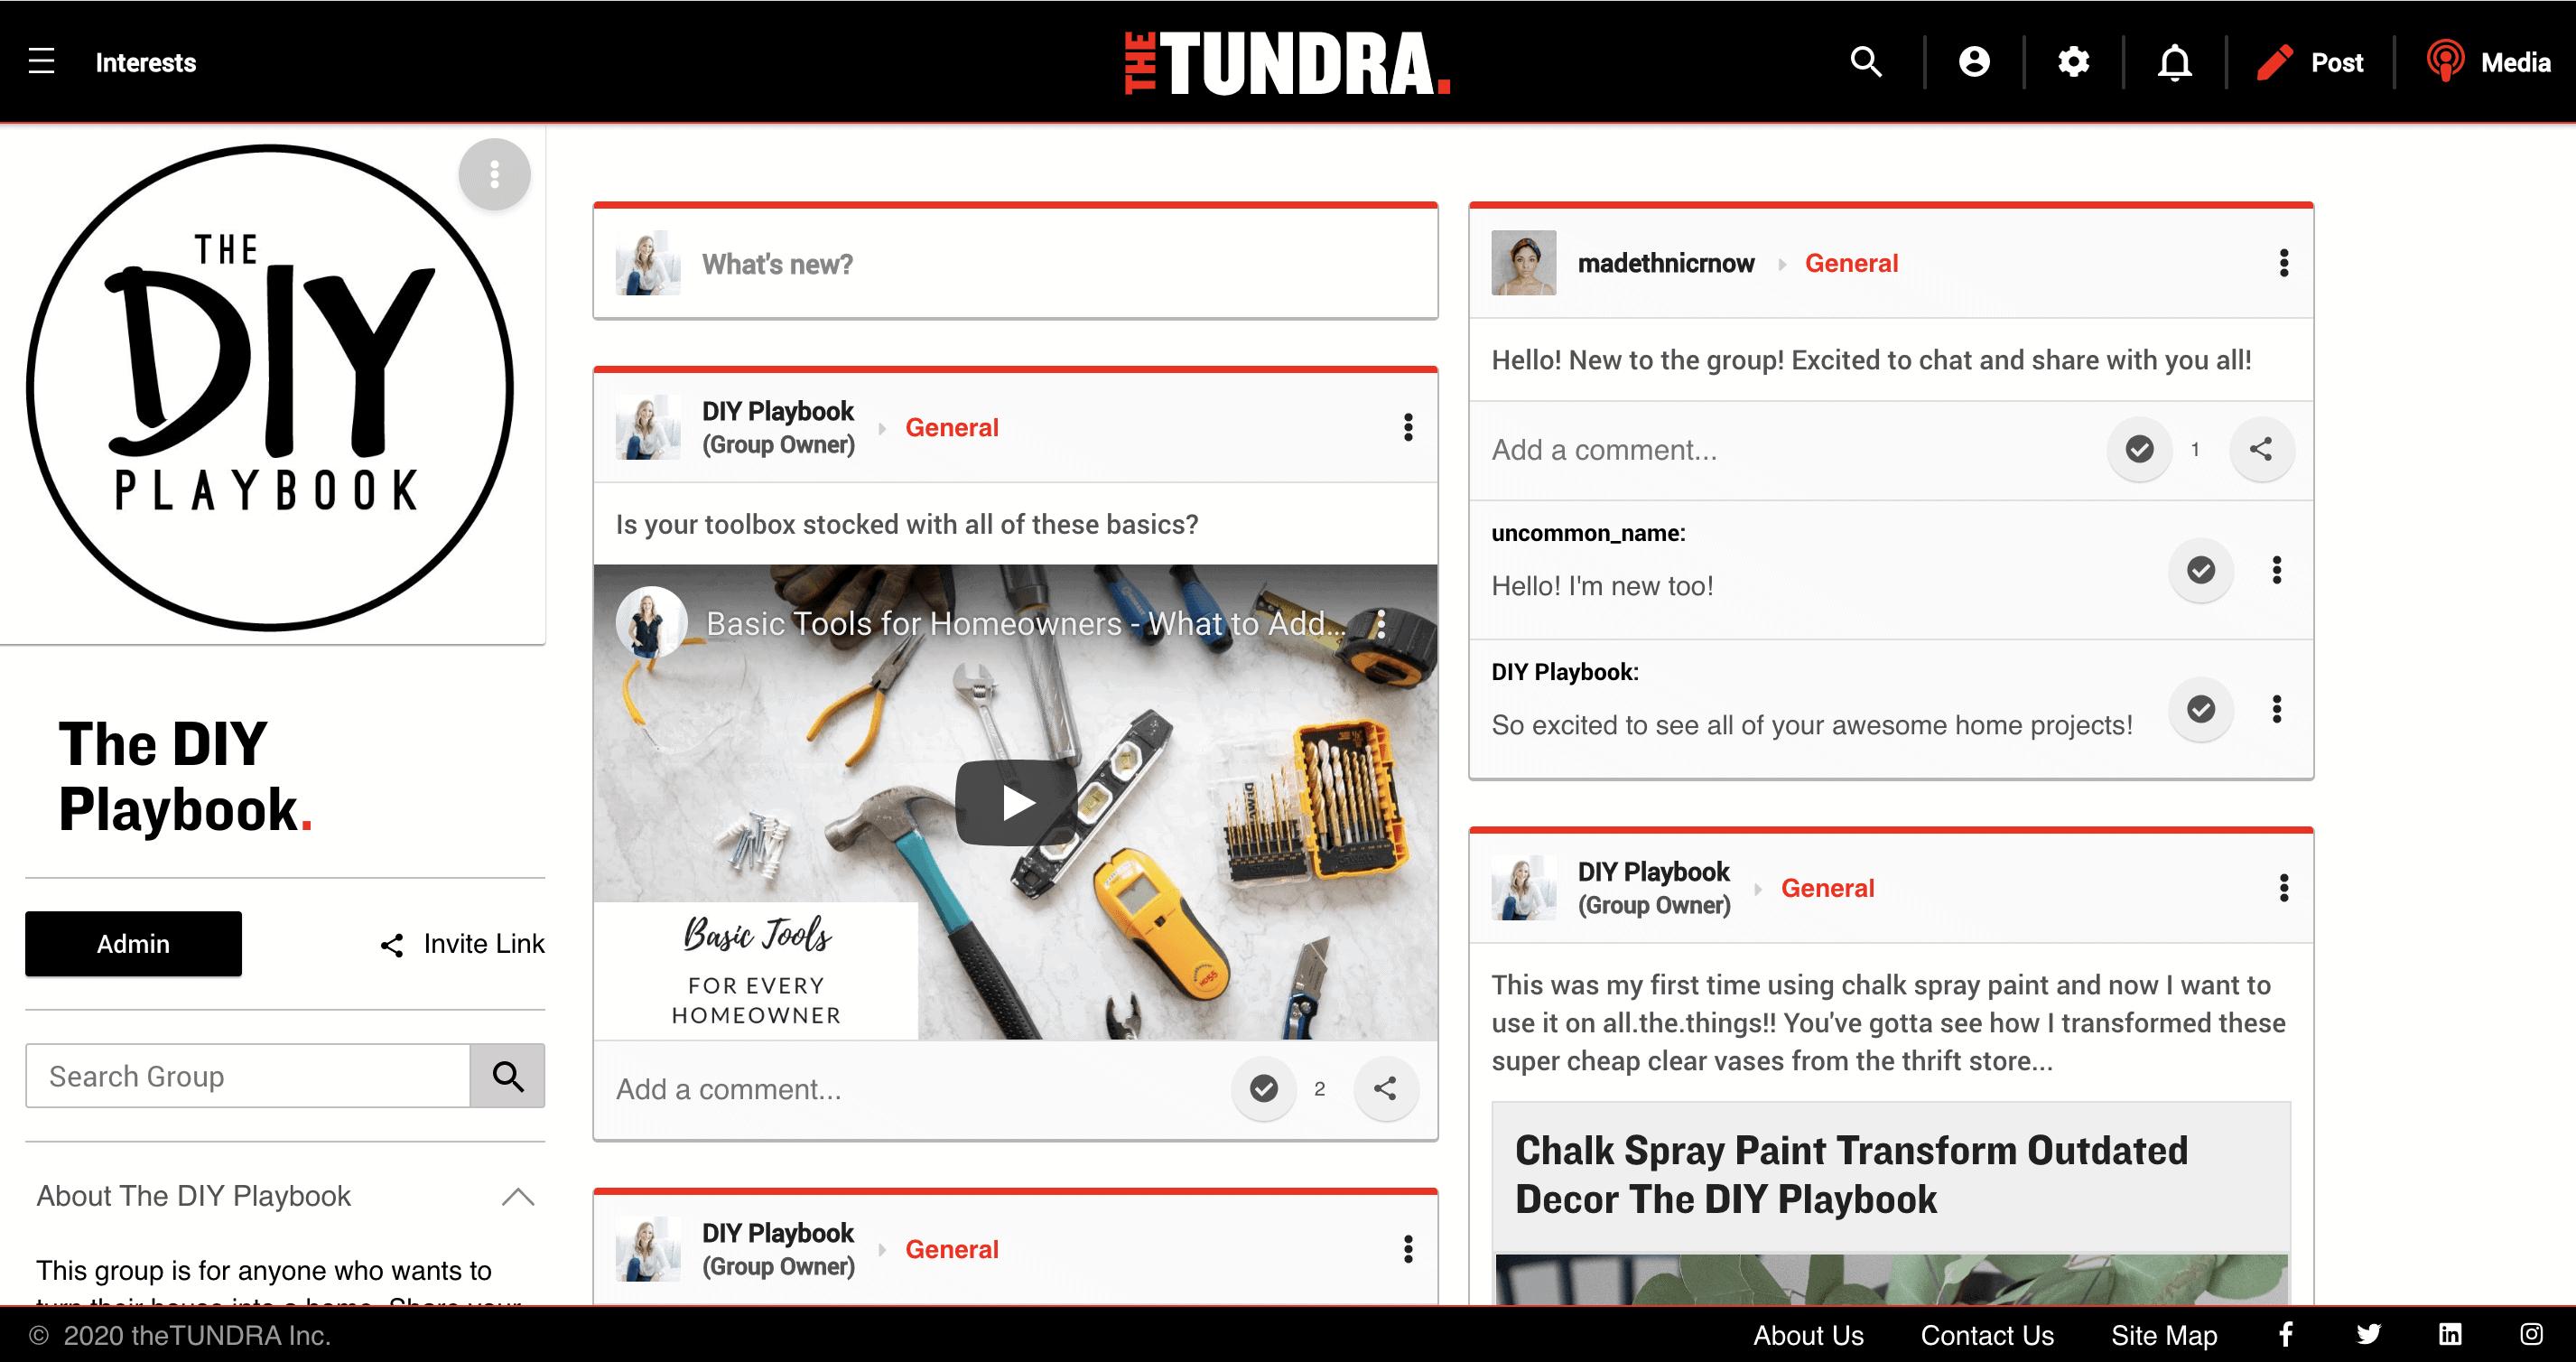 The tundra DIY Playbook group